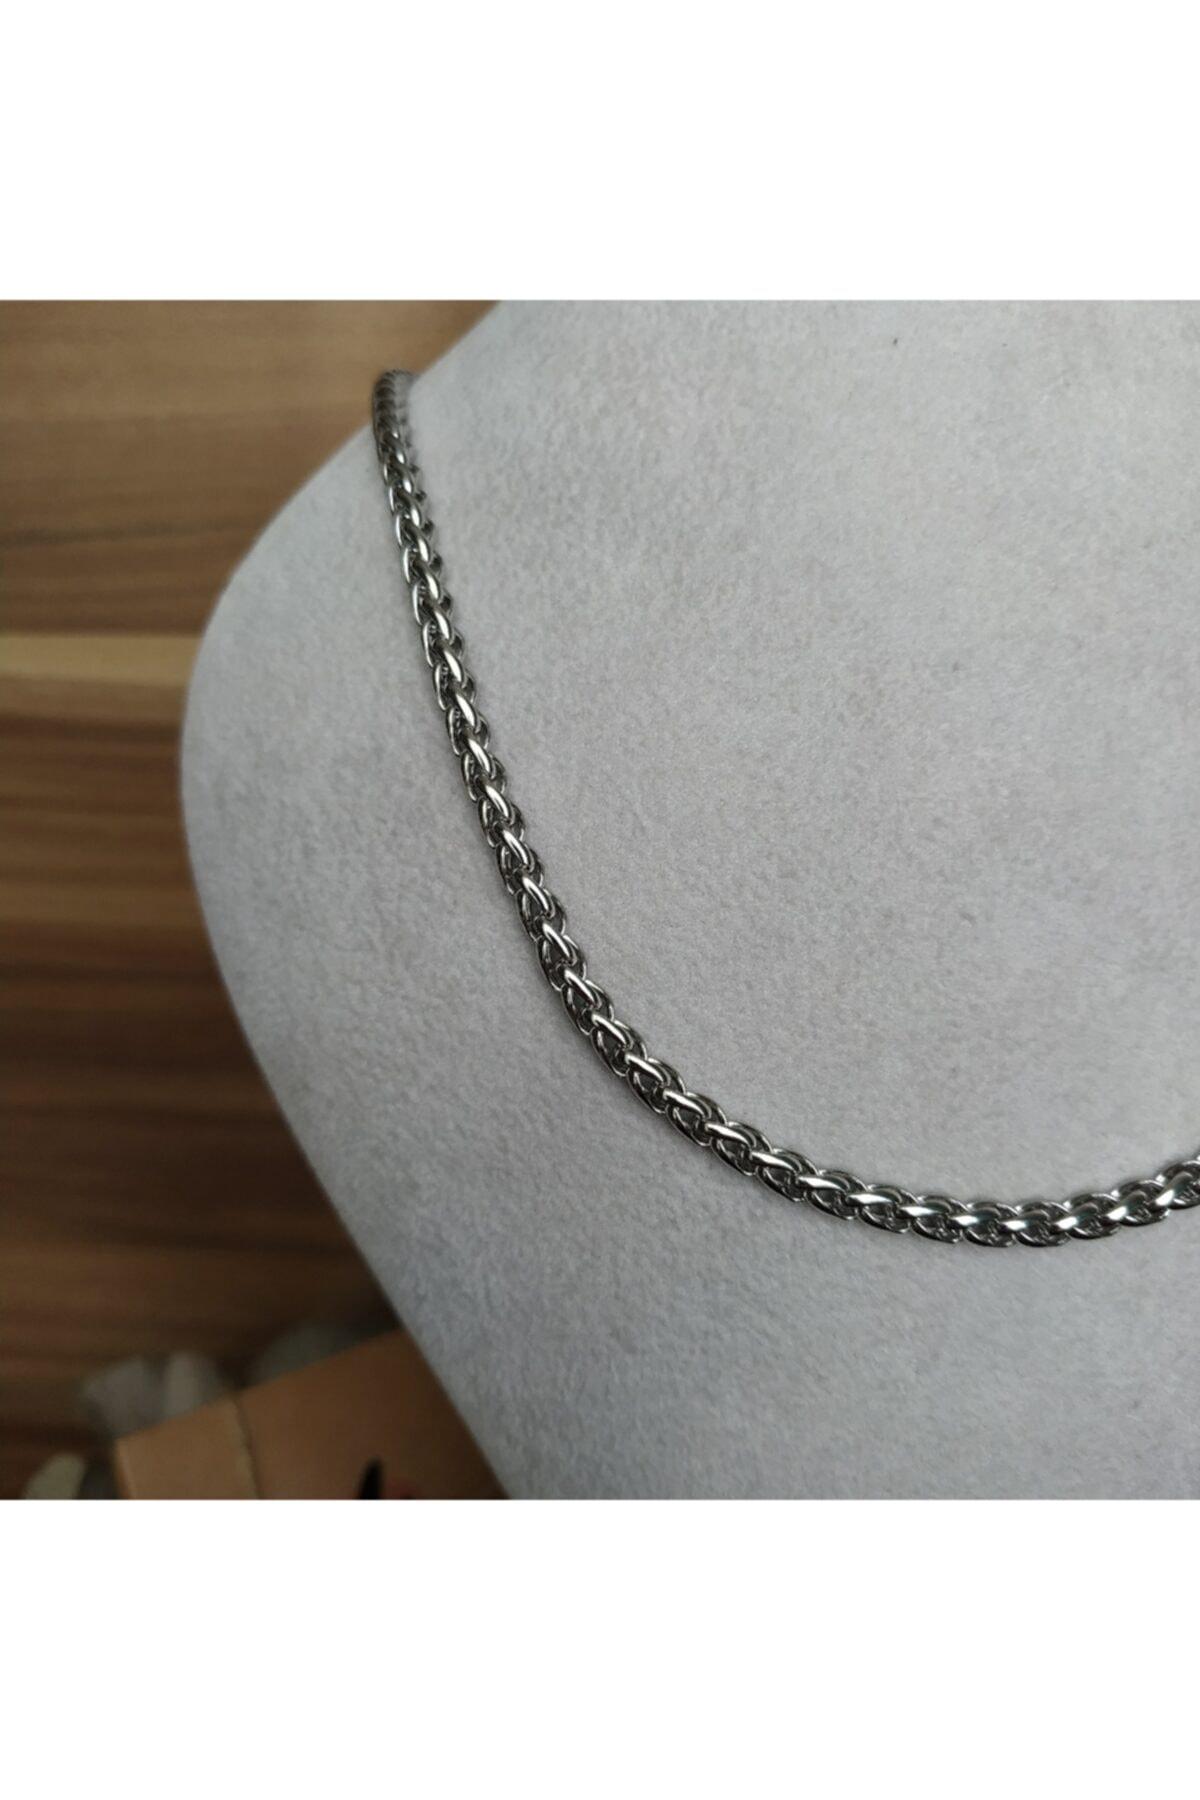 Mammamia 50cm Ally 4mm Silver Halat Örgü Zincir Çelik Kolye 2